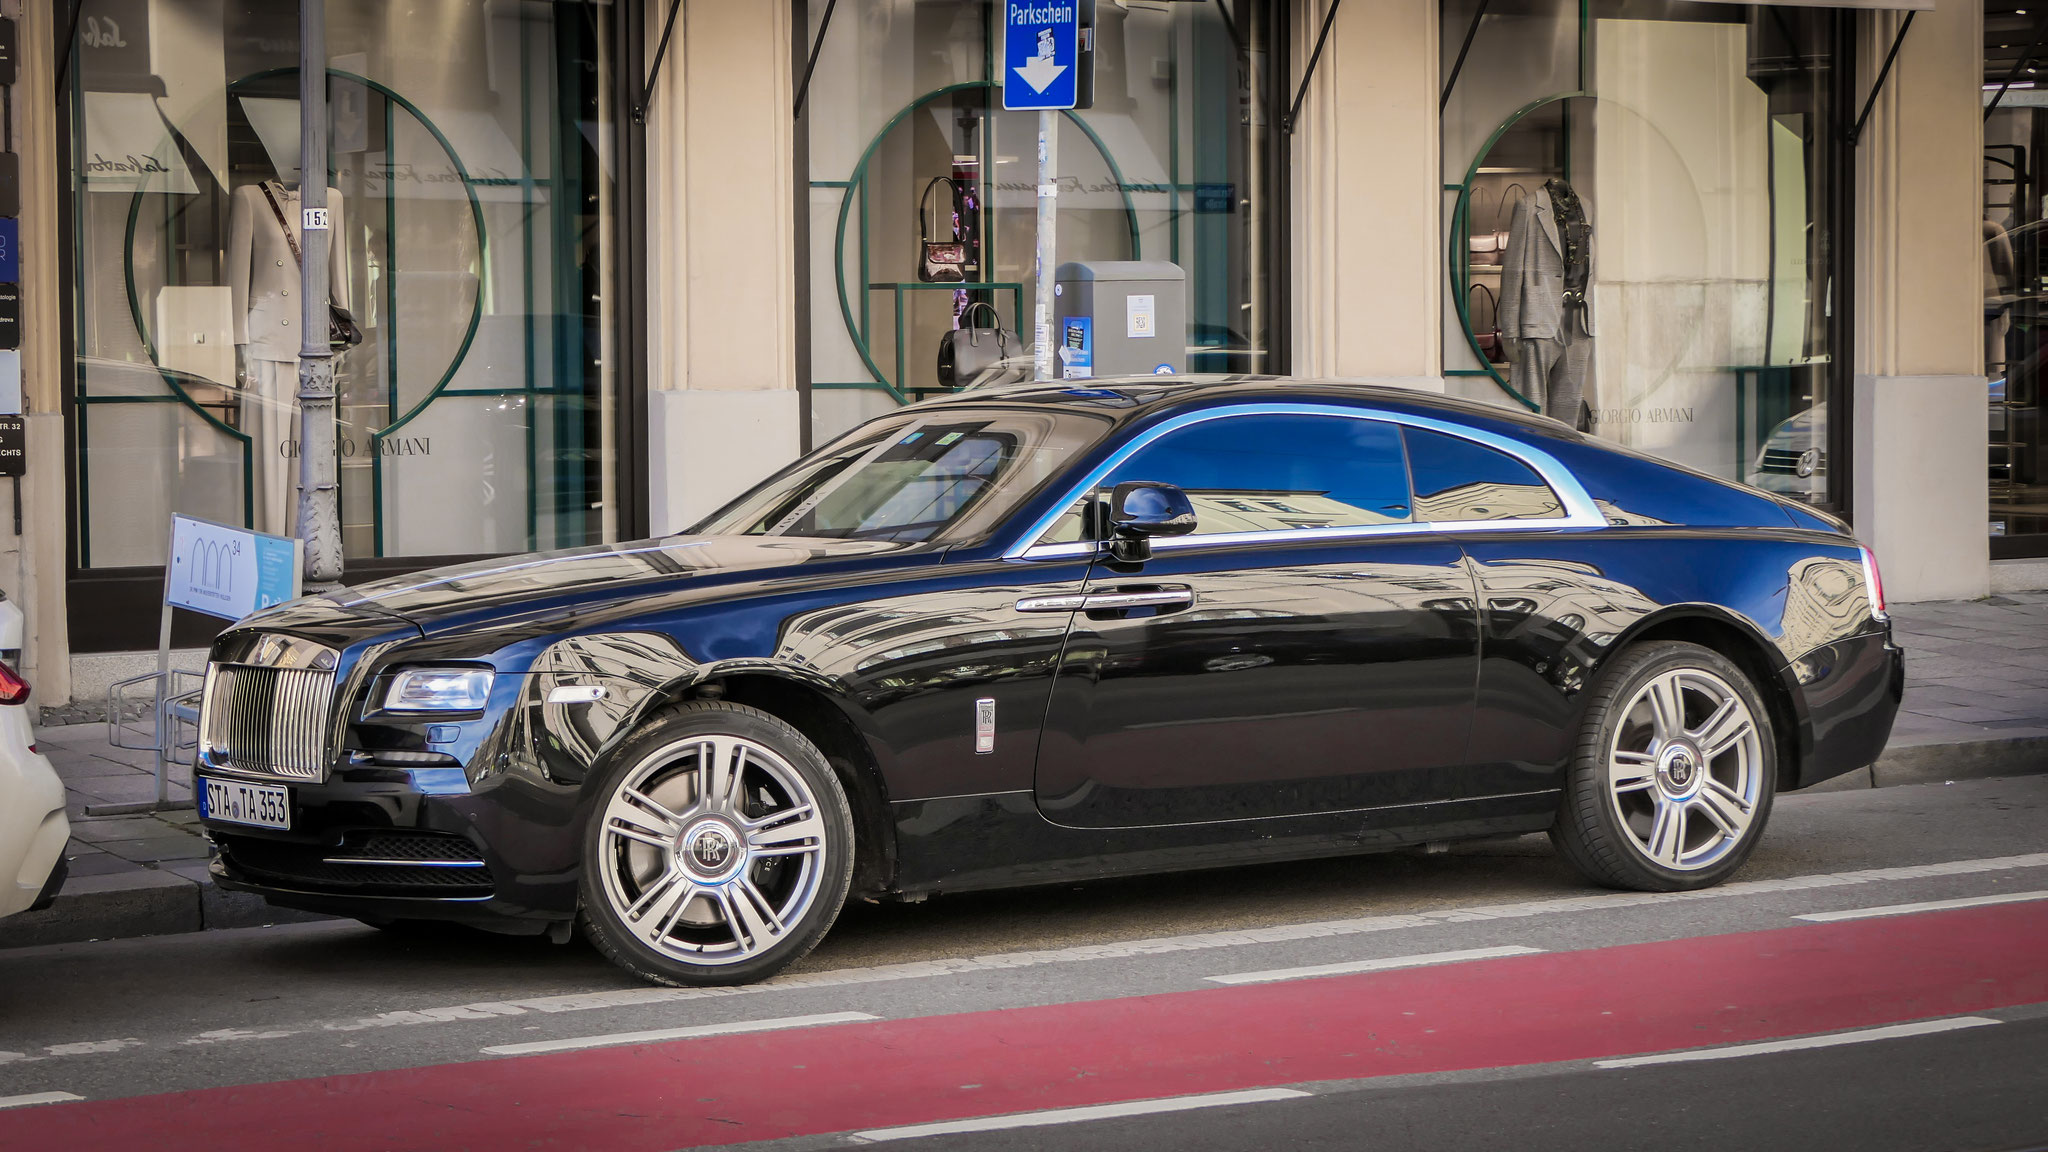 Rolls Royce Wraith - STA-TA-353